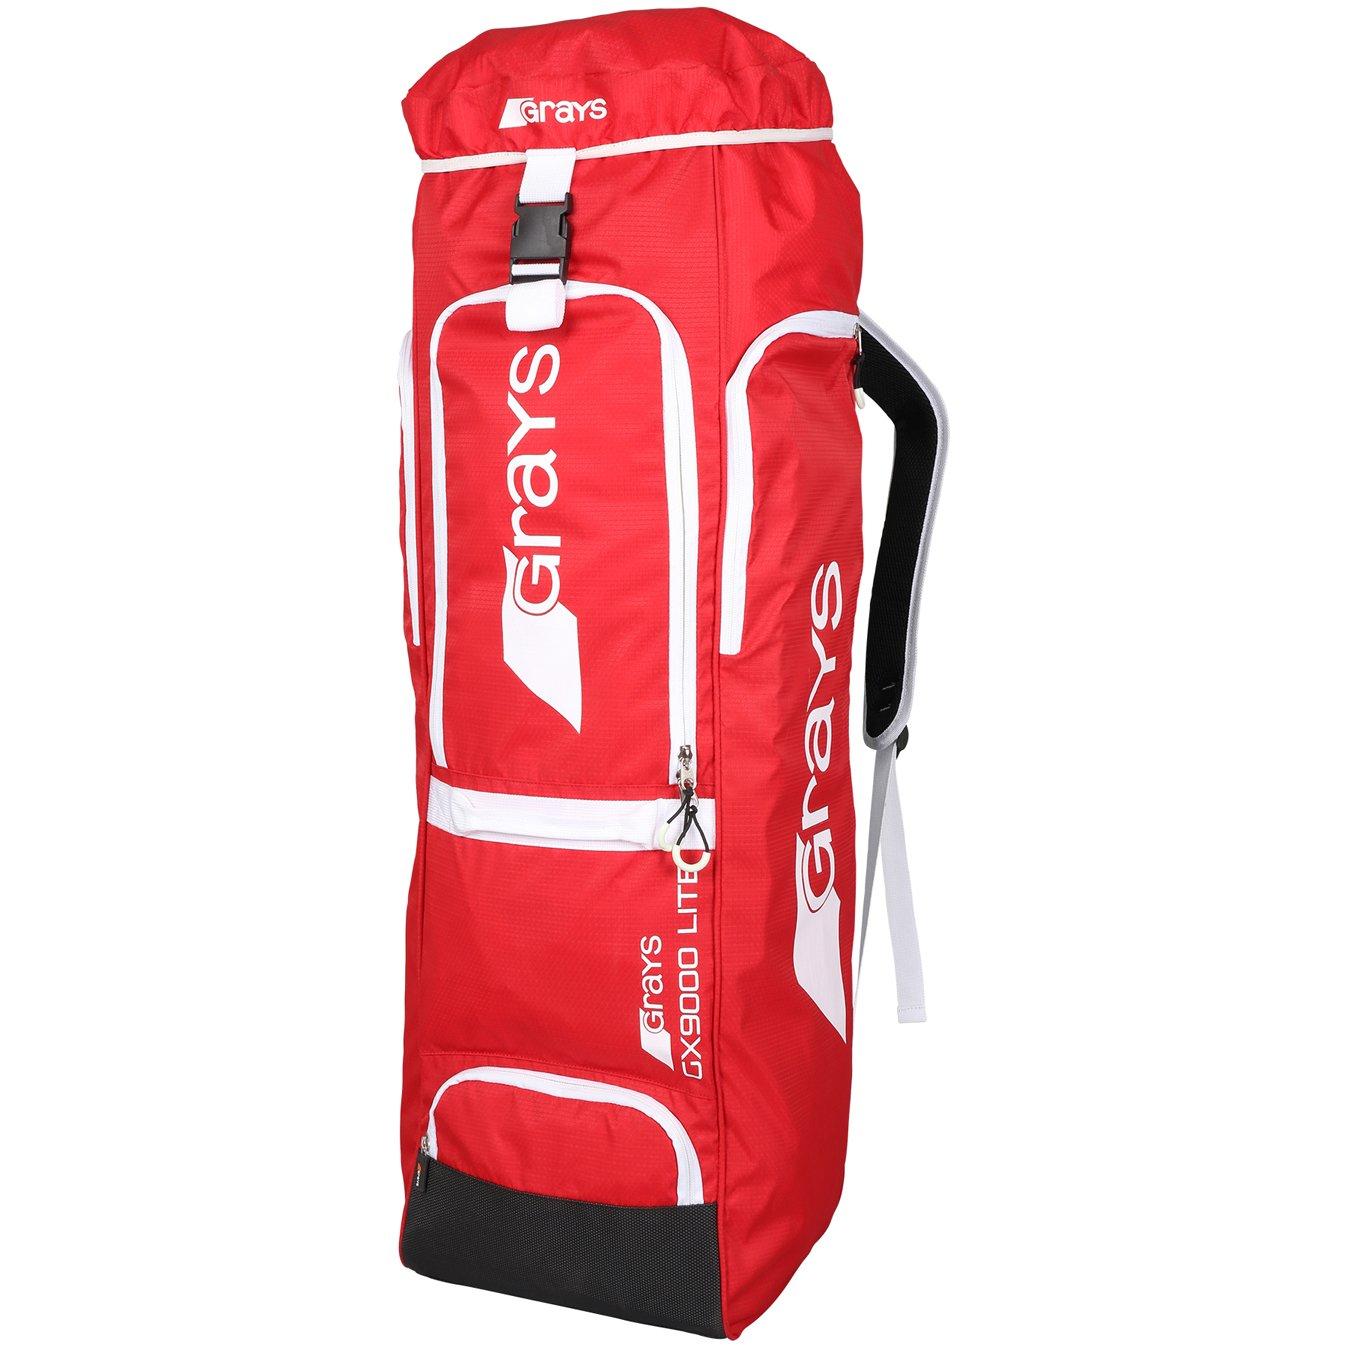 Grays GX9000 Lite Hockey Stick/Kit bag - Red 246603002